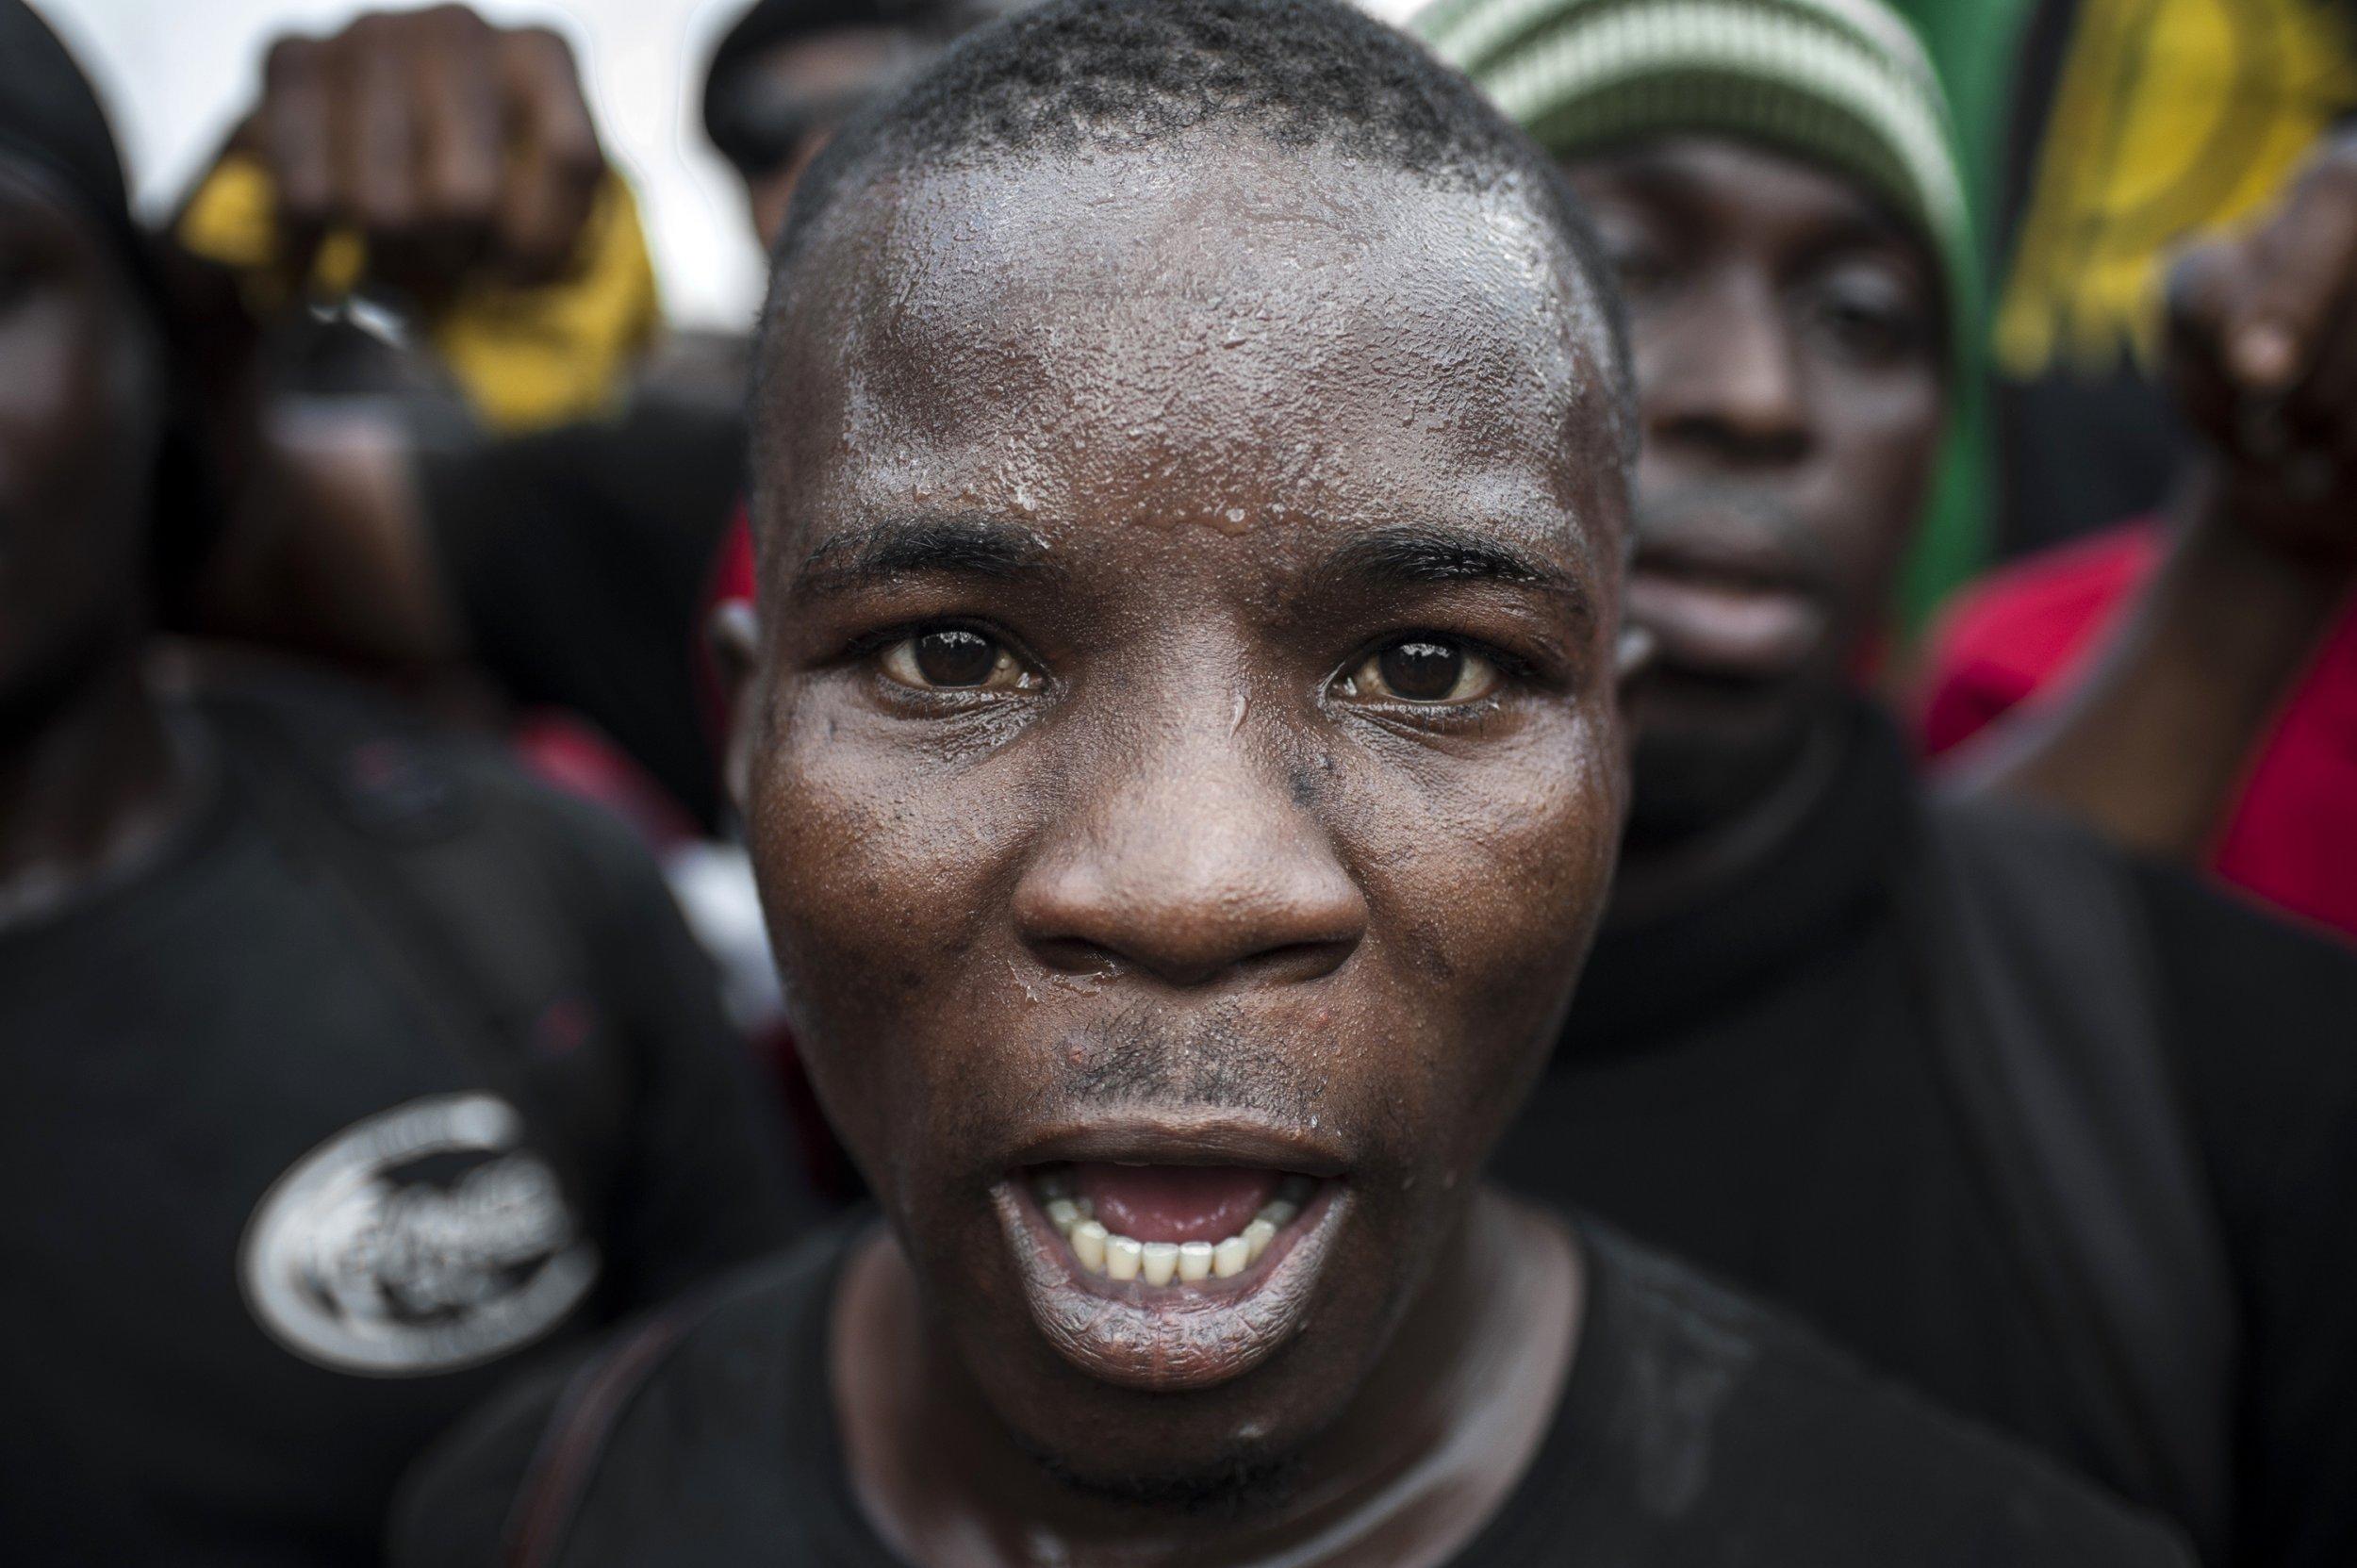 Biafra supporter